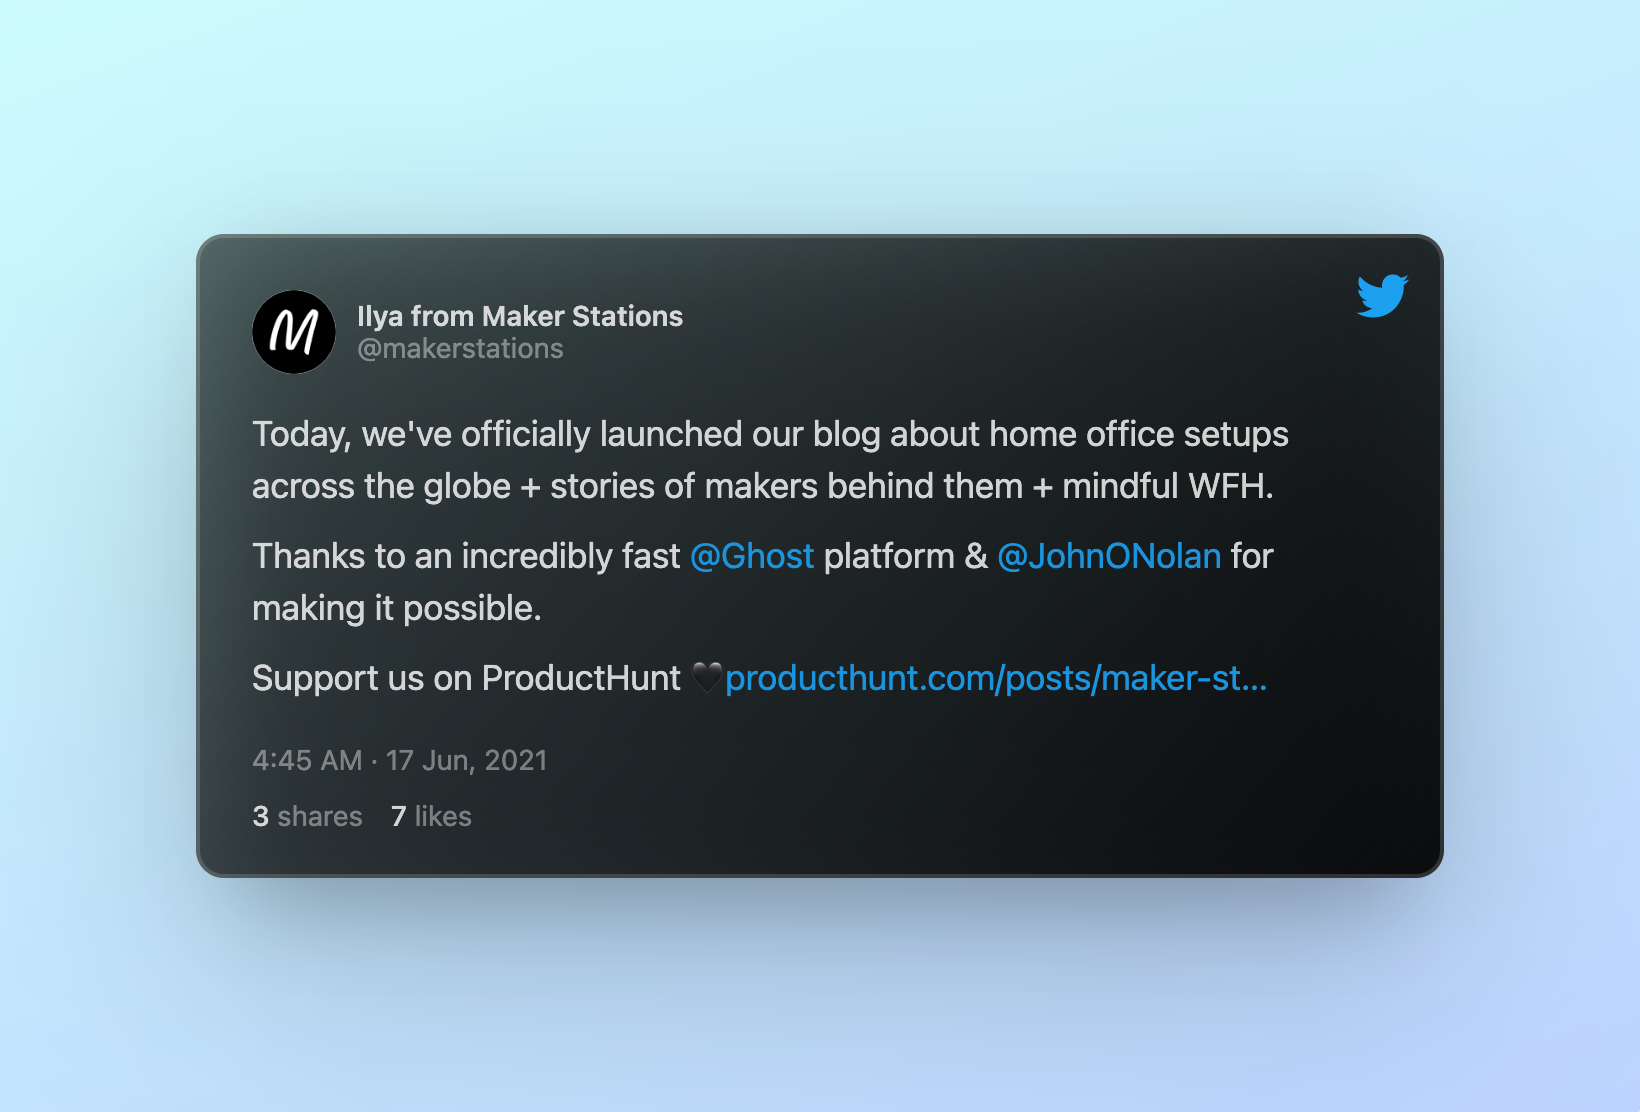 Tweet by Ilya from Maker Stations